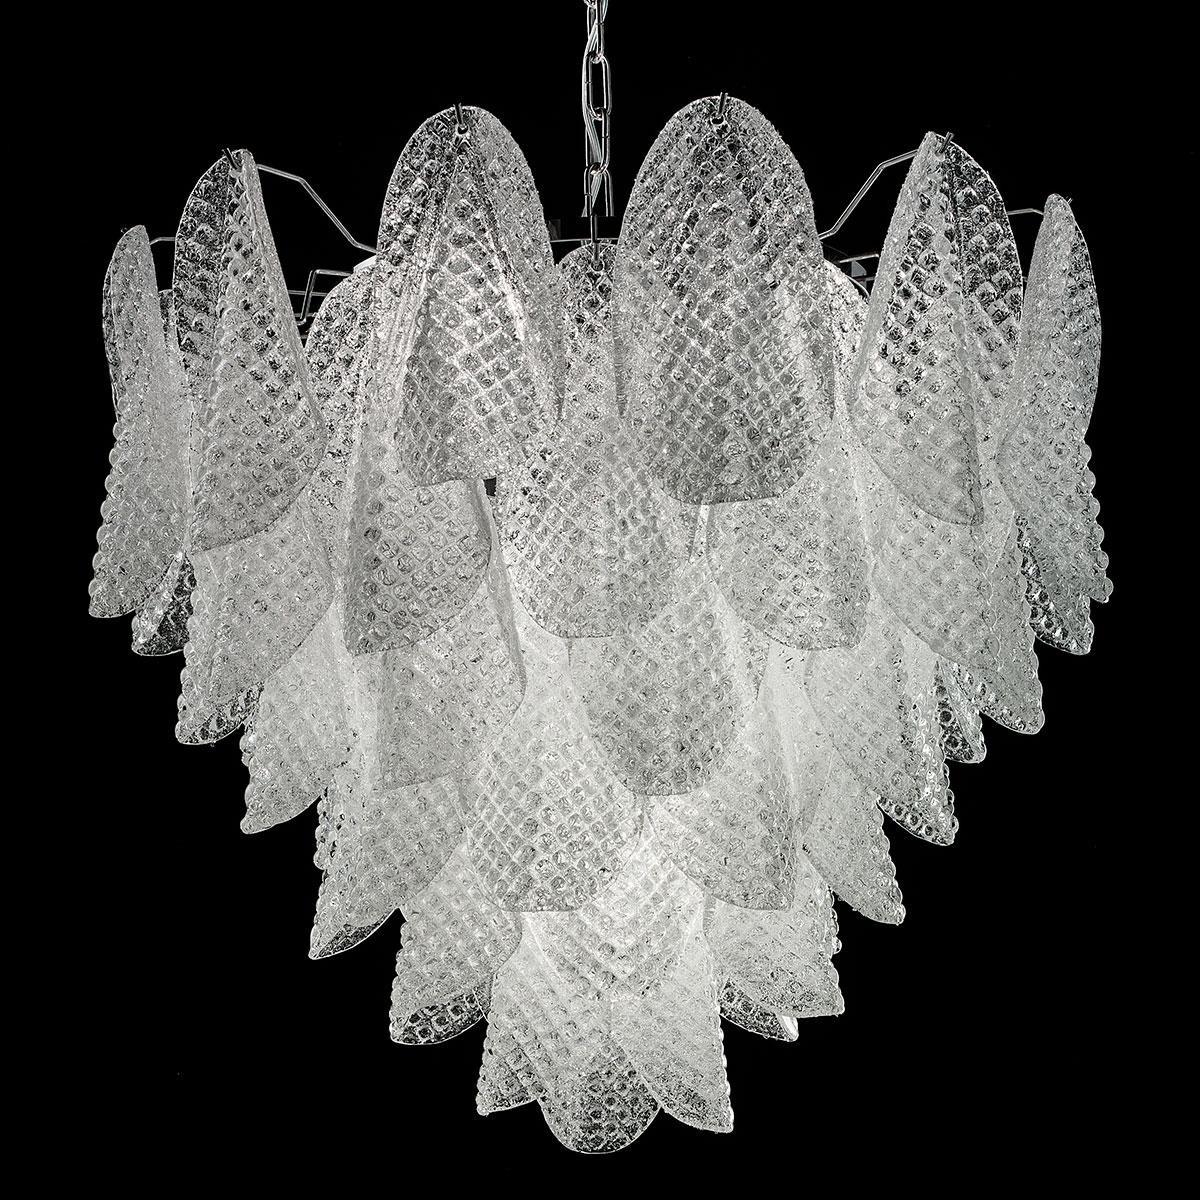 """Rita"" Murano glass chandelier - 7 lights - white and chrome"